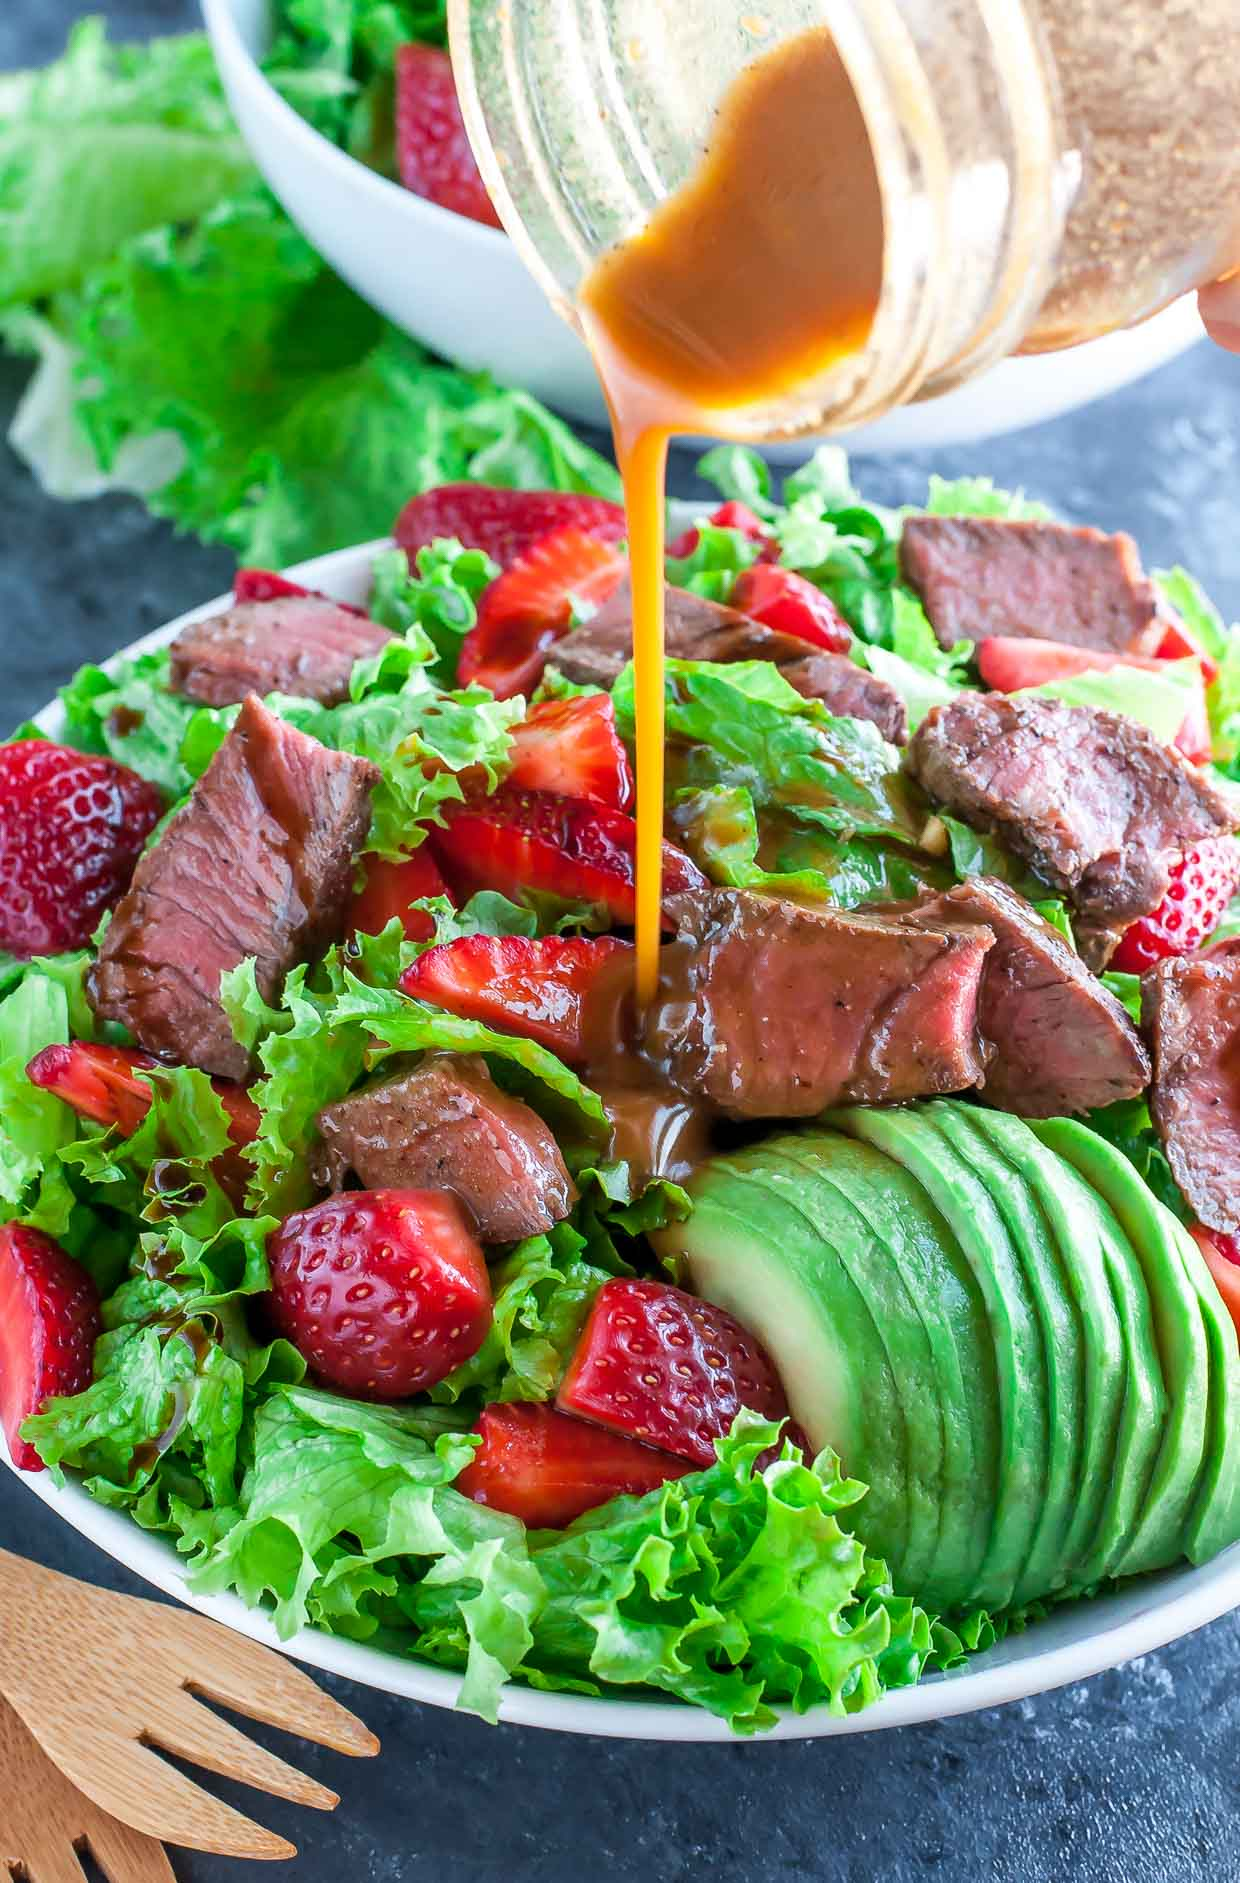 Strawberry Steak Salad With Homemade Balsamic Dressing